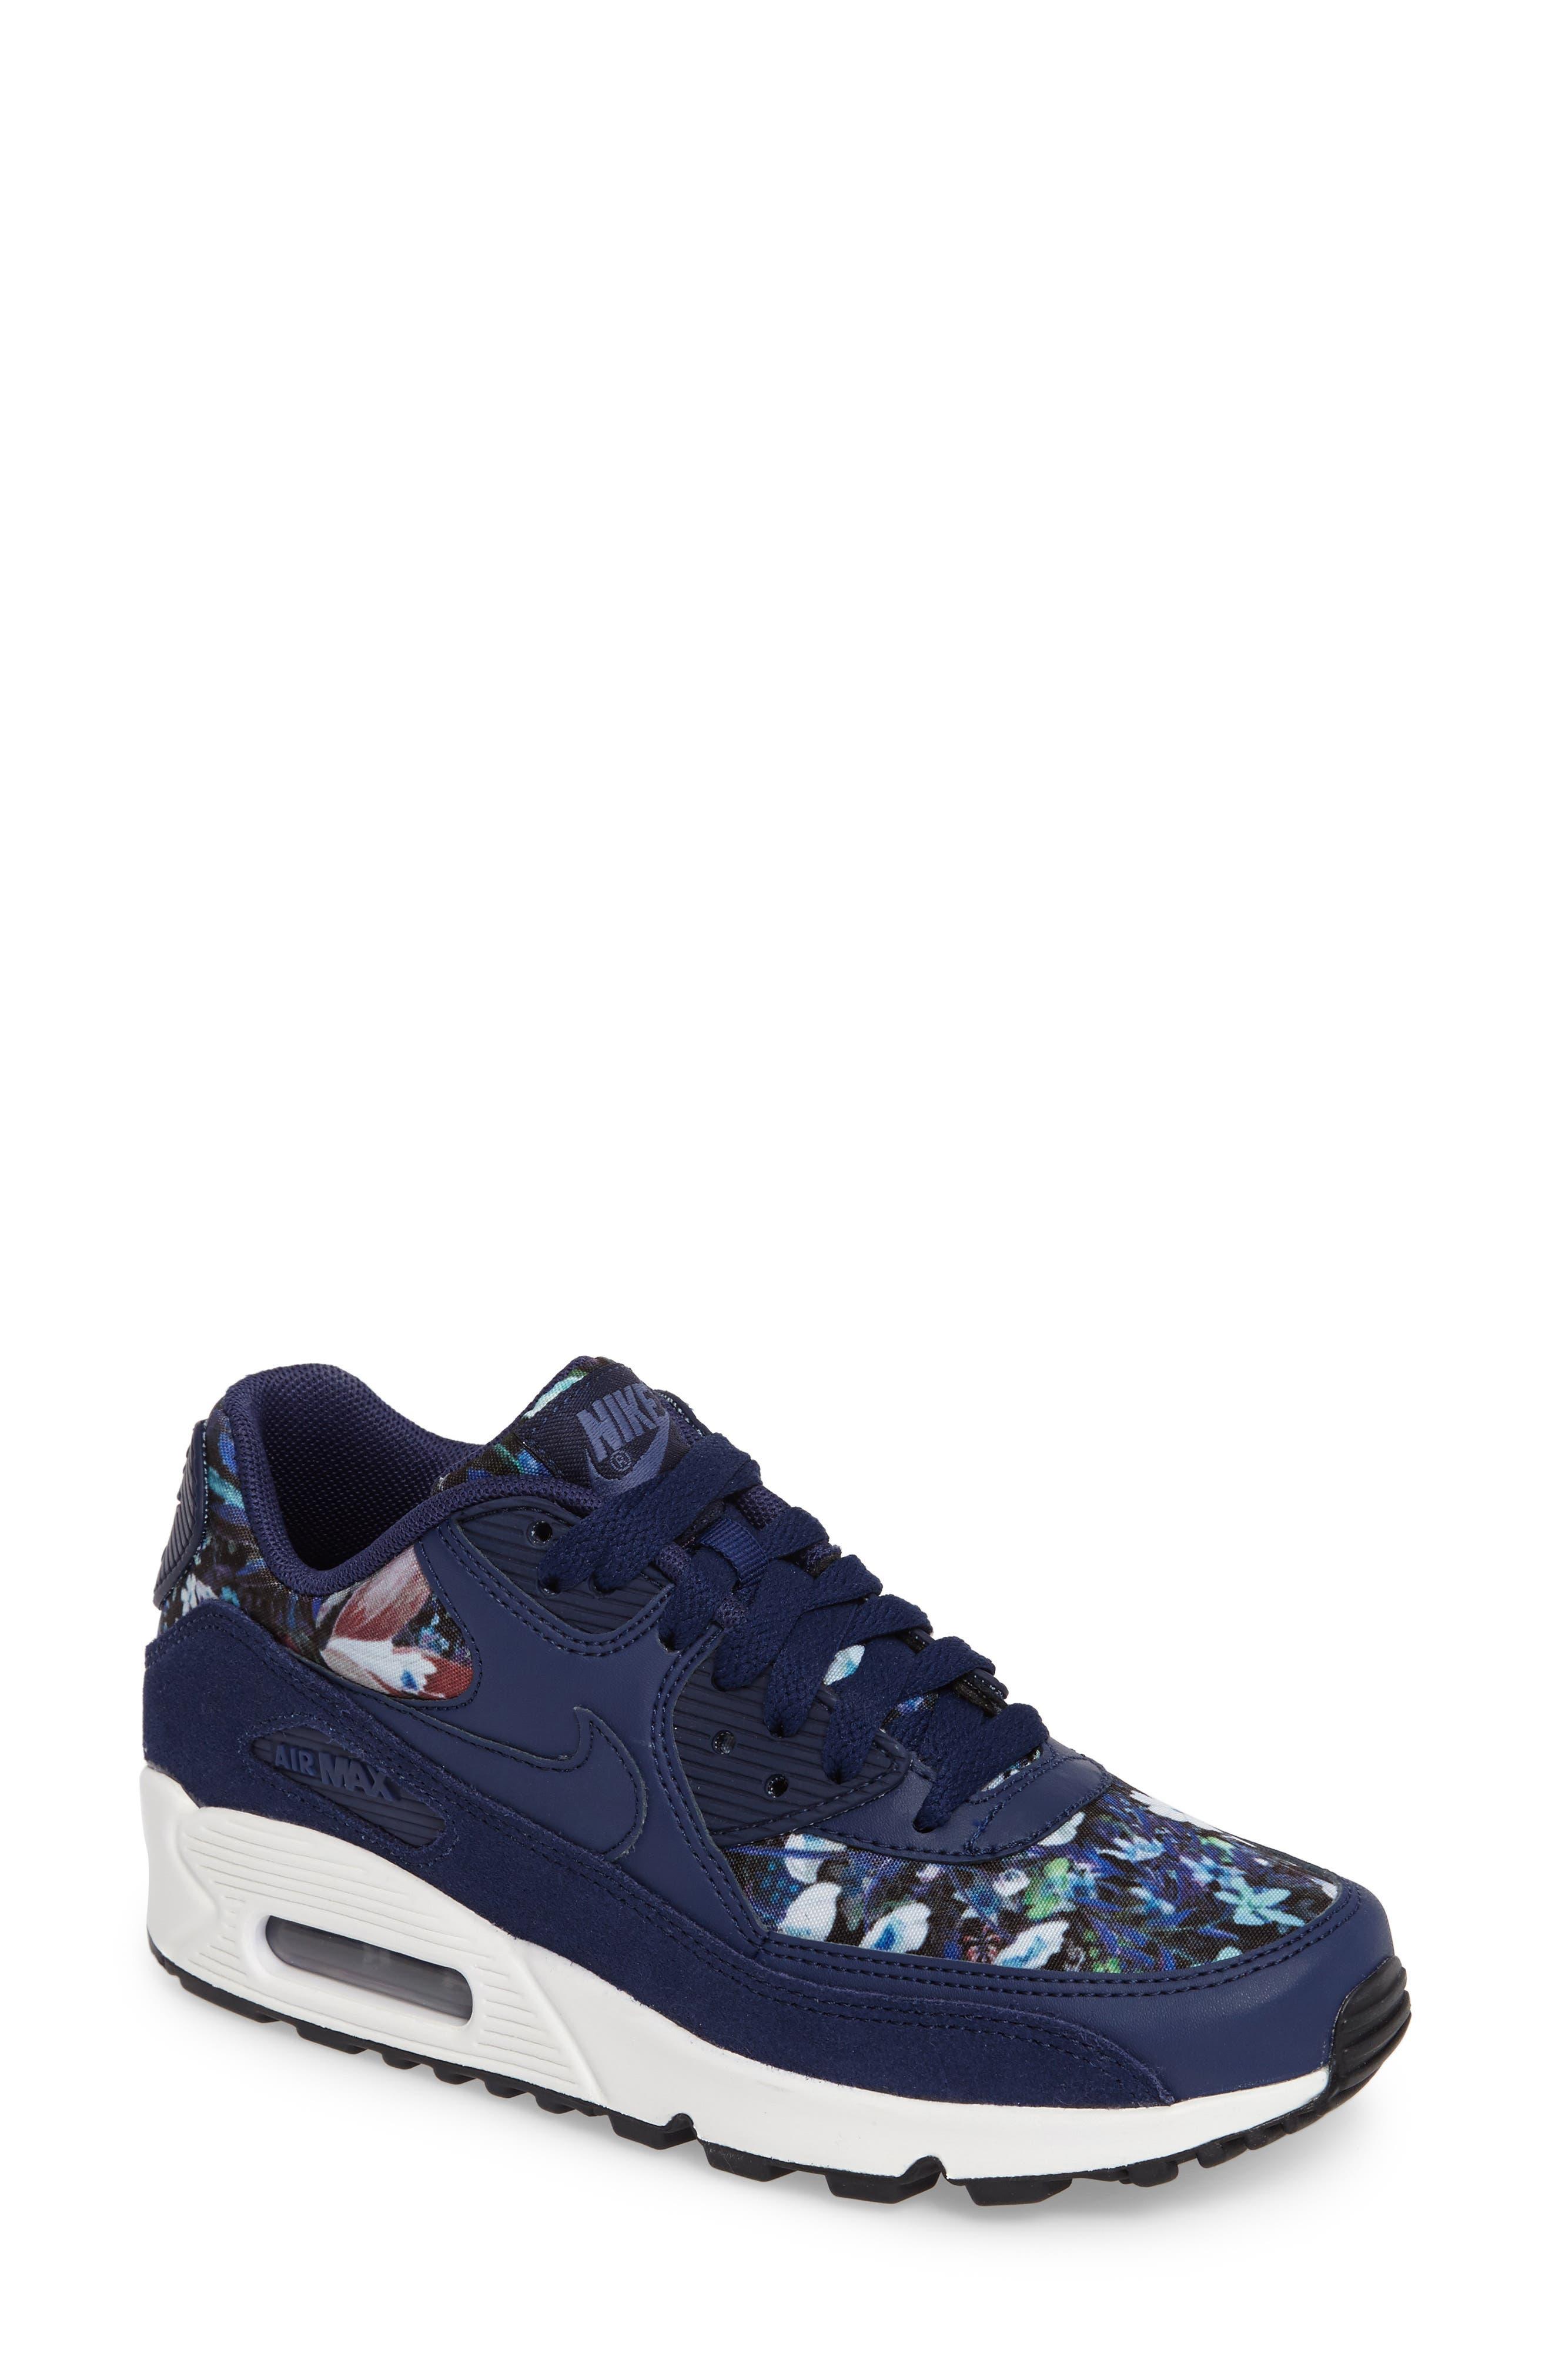 Air Max 90 SE Sneaker,                             Main thumbnail 6, color,